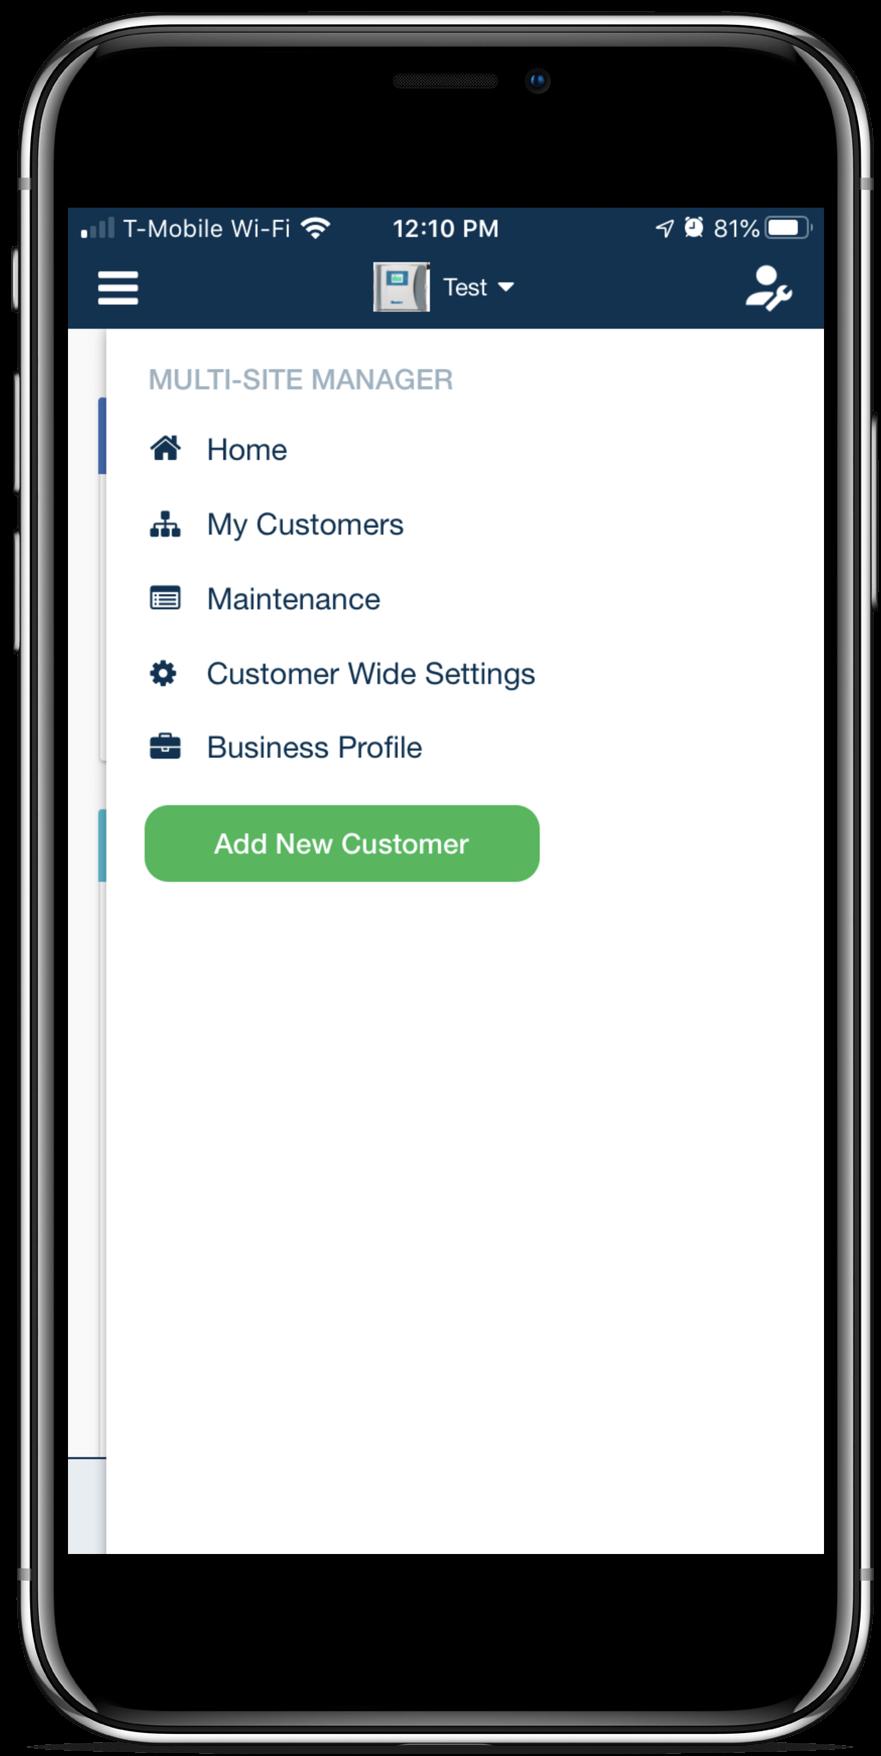 Customer_Access_1_en-us.png